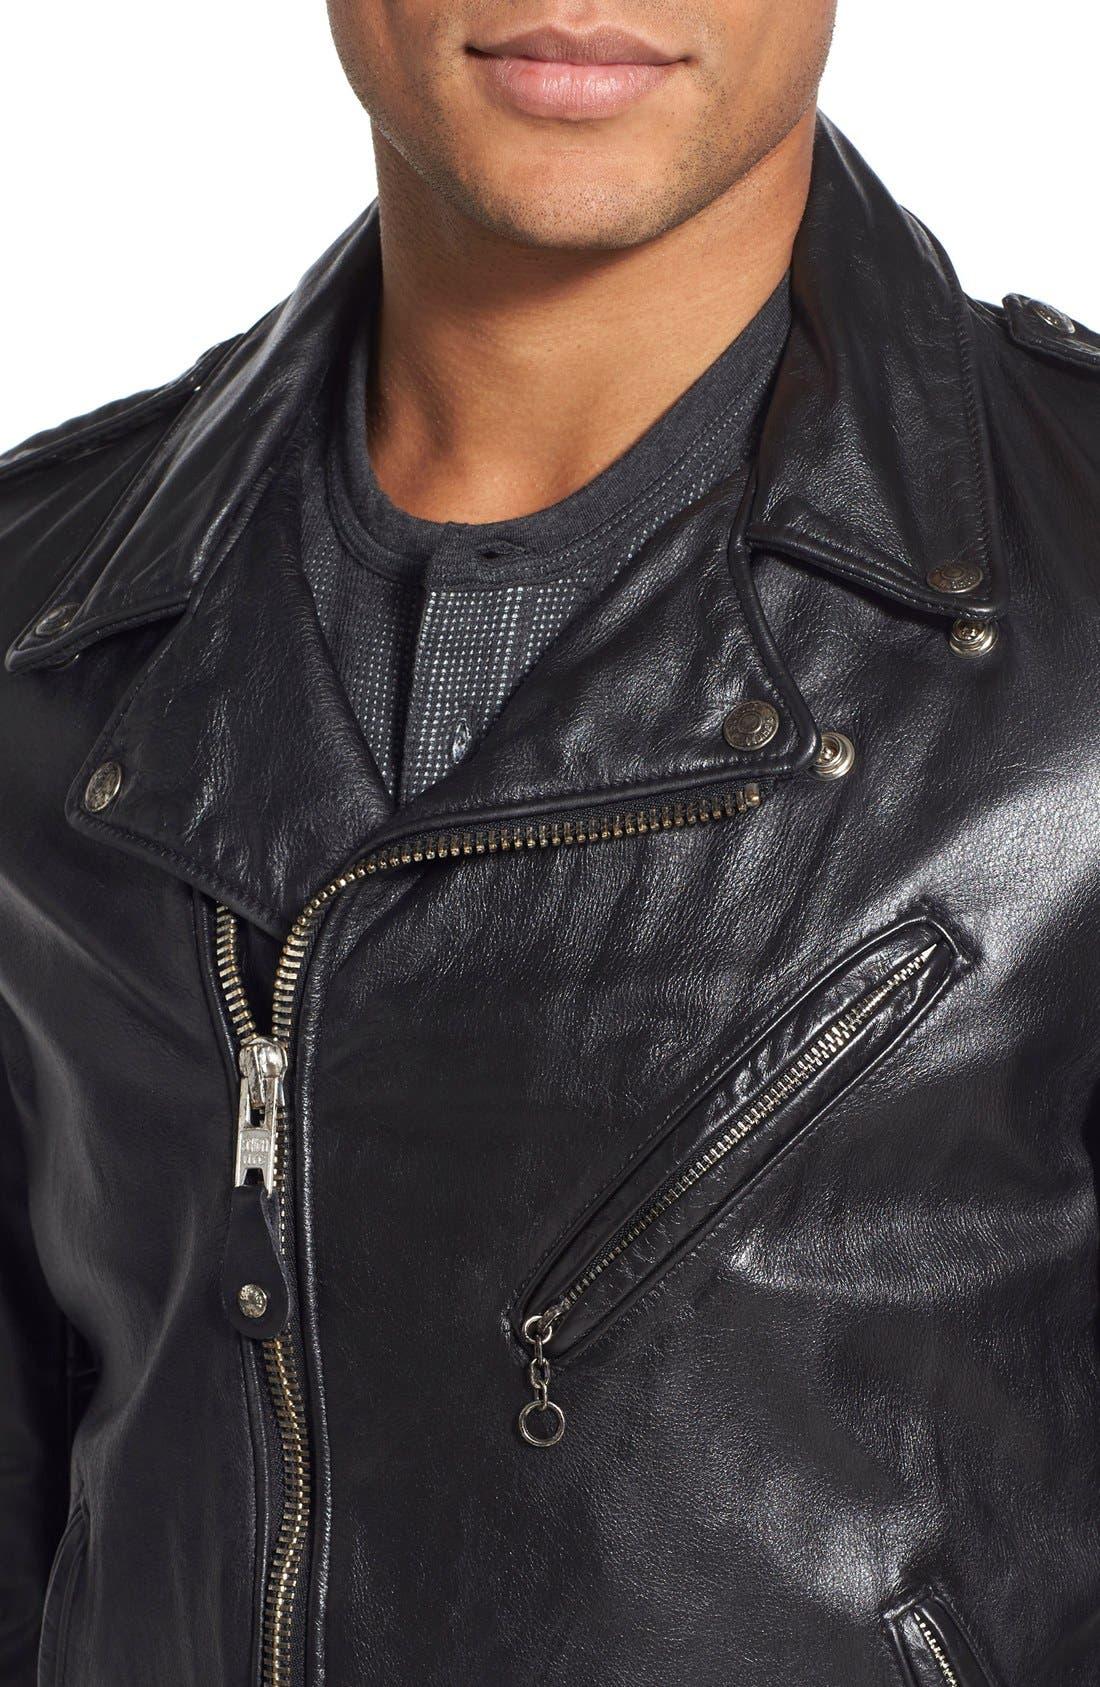 Hand Vintaged Cowhide Leather Motocycle Jacket,                             Alternate thumbnail 7, color,                             BLACK